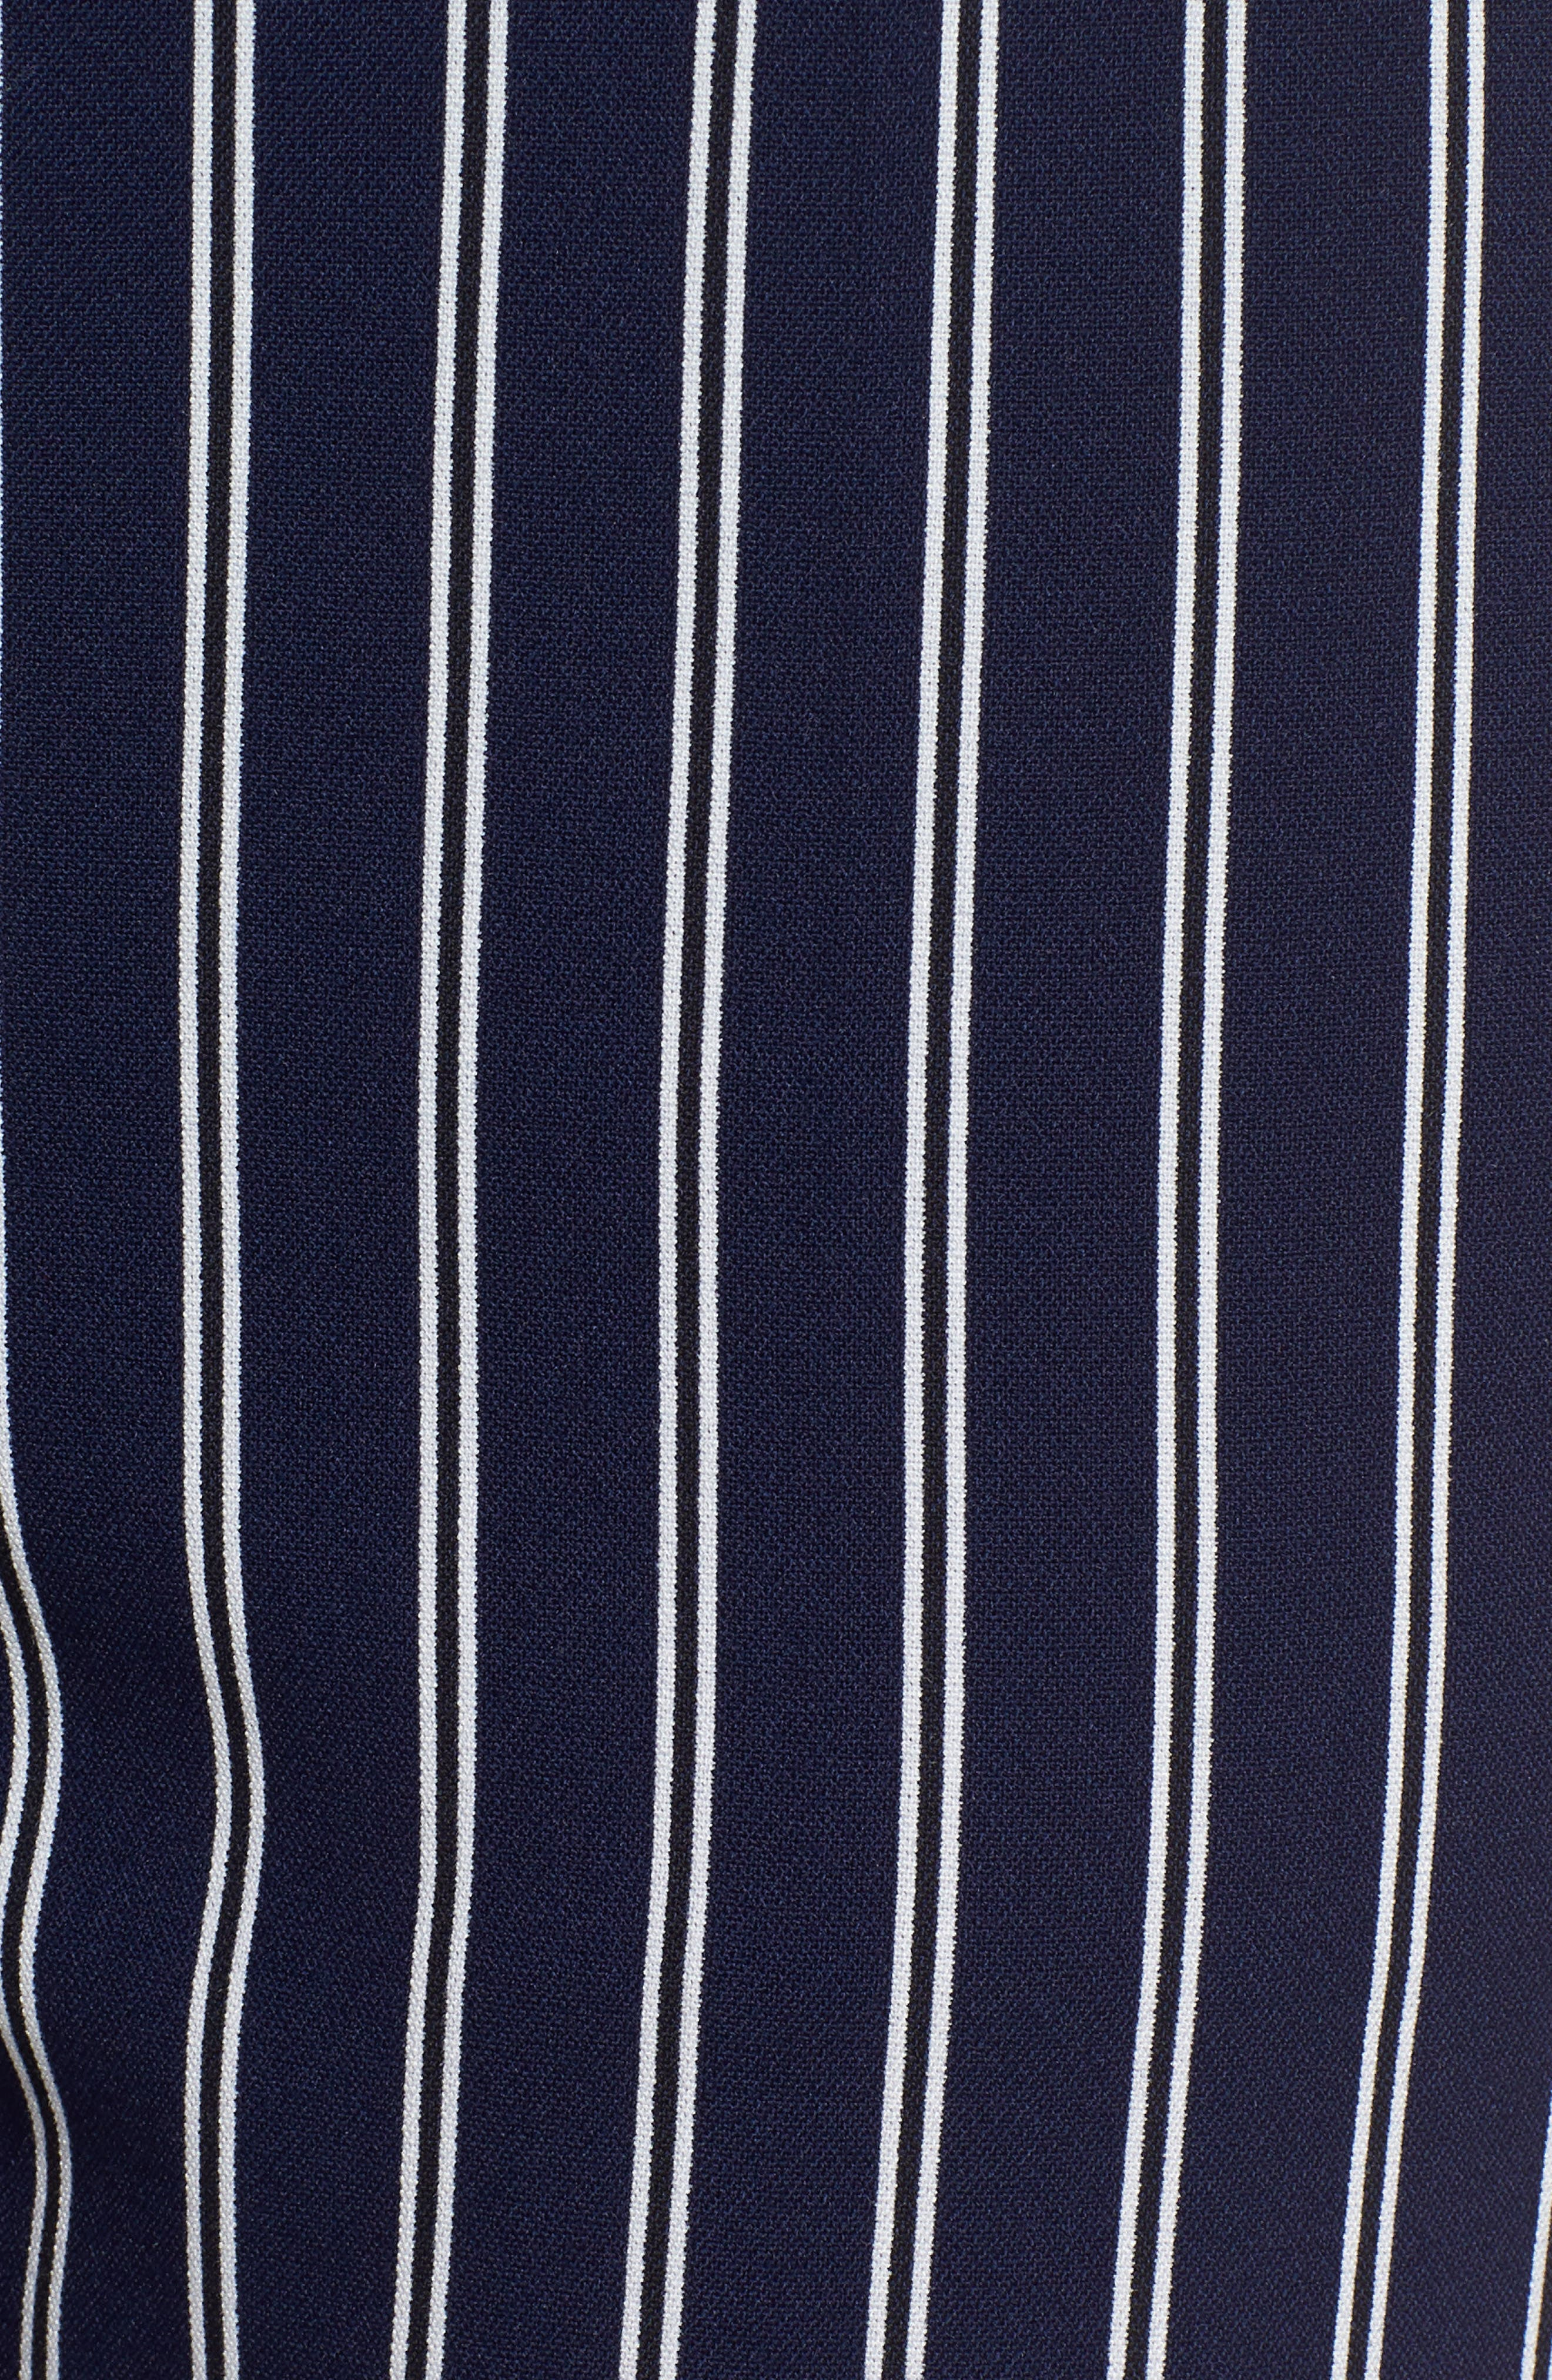 Tebella Stripe Pants,                             Alternate thumbnail 6, color,